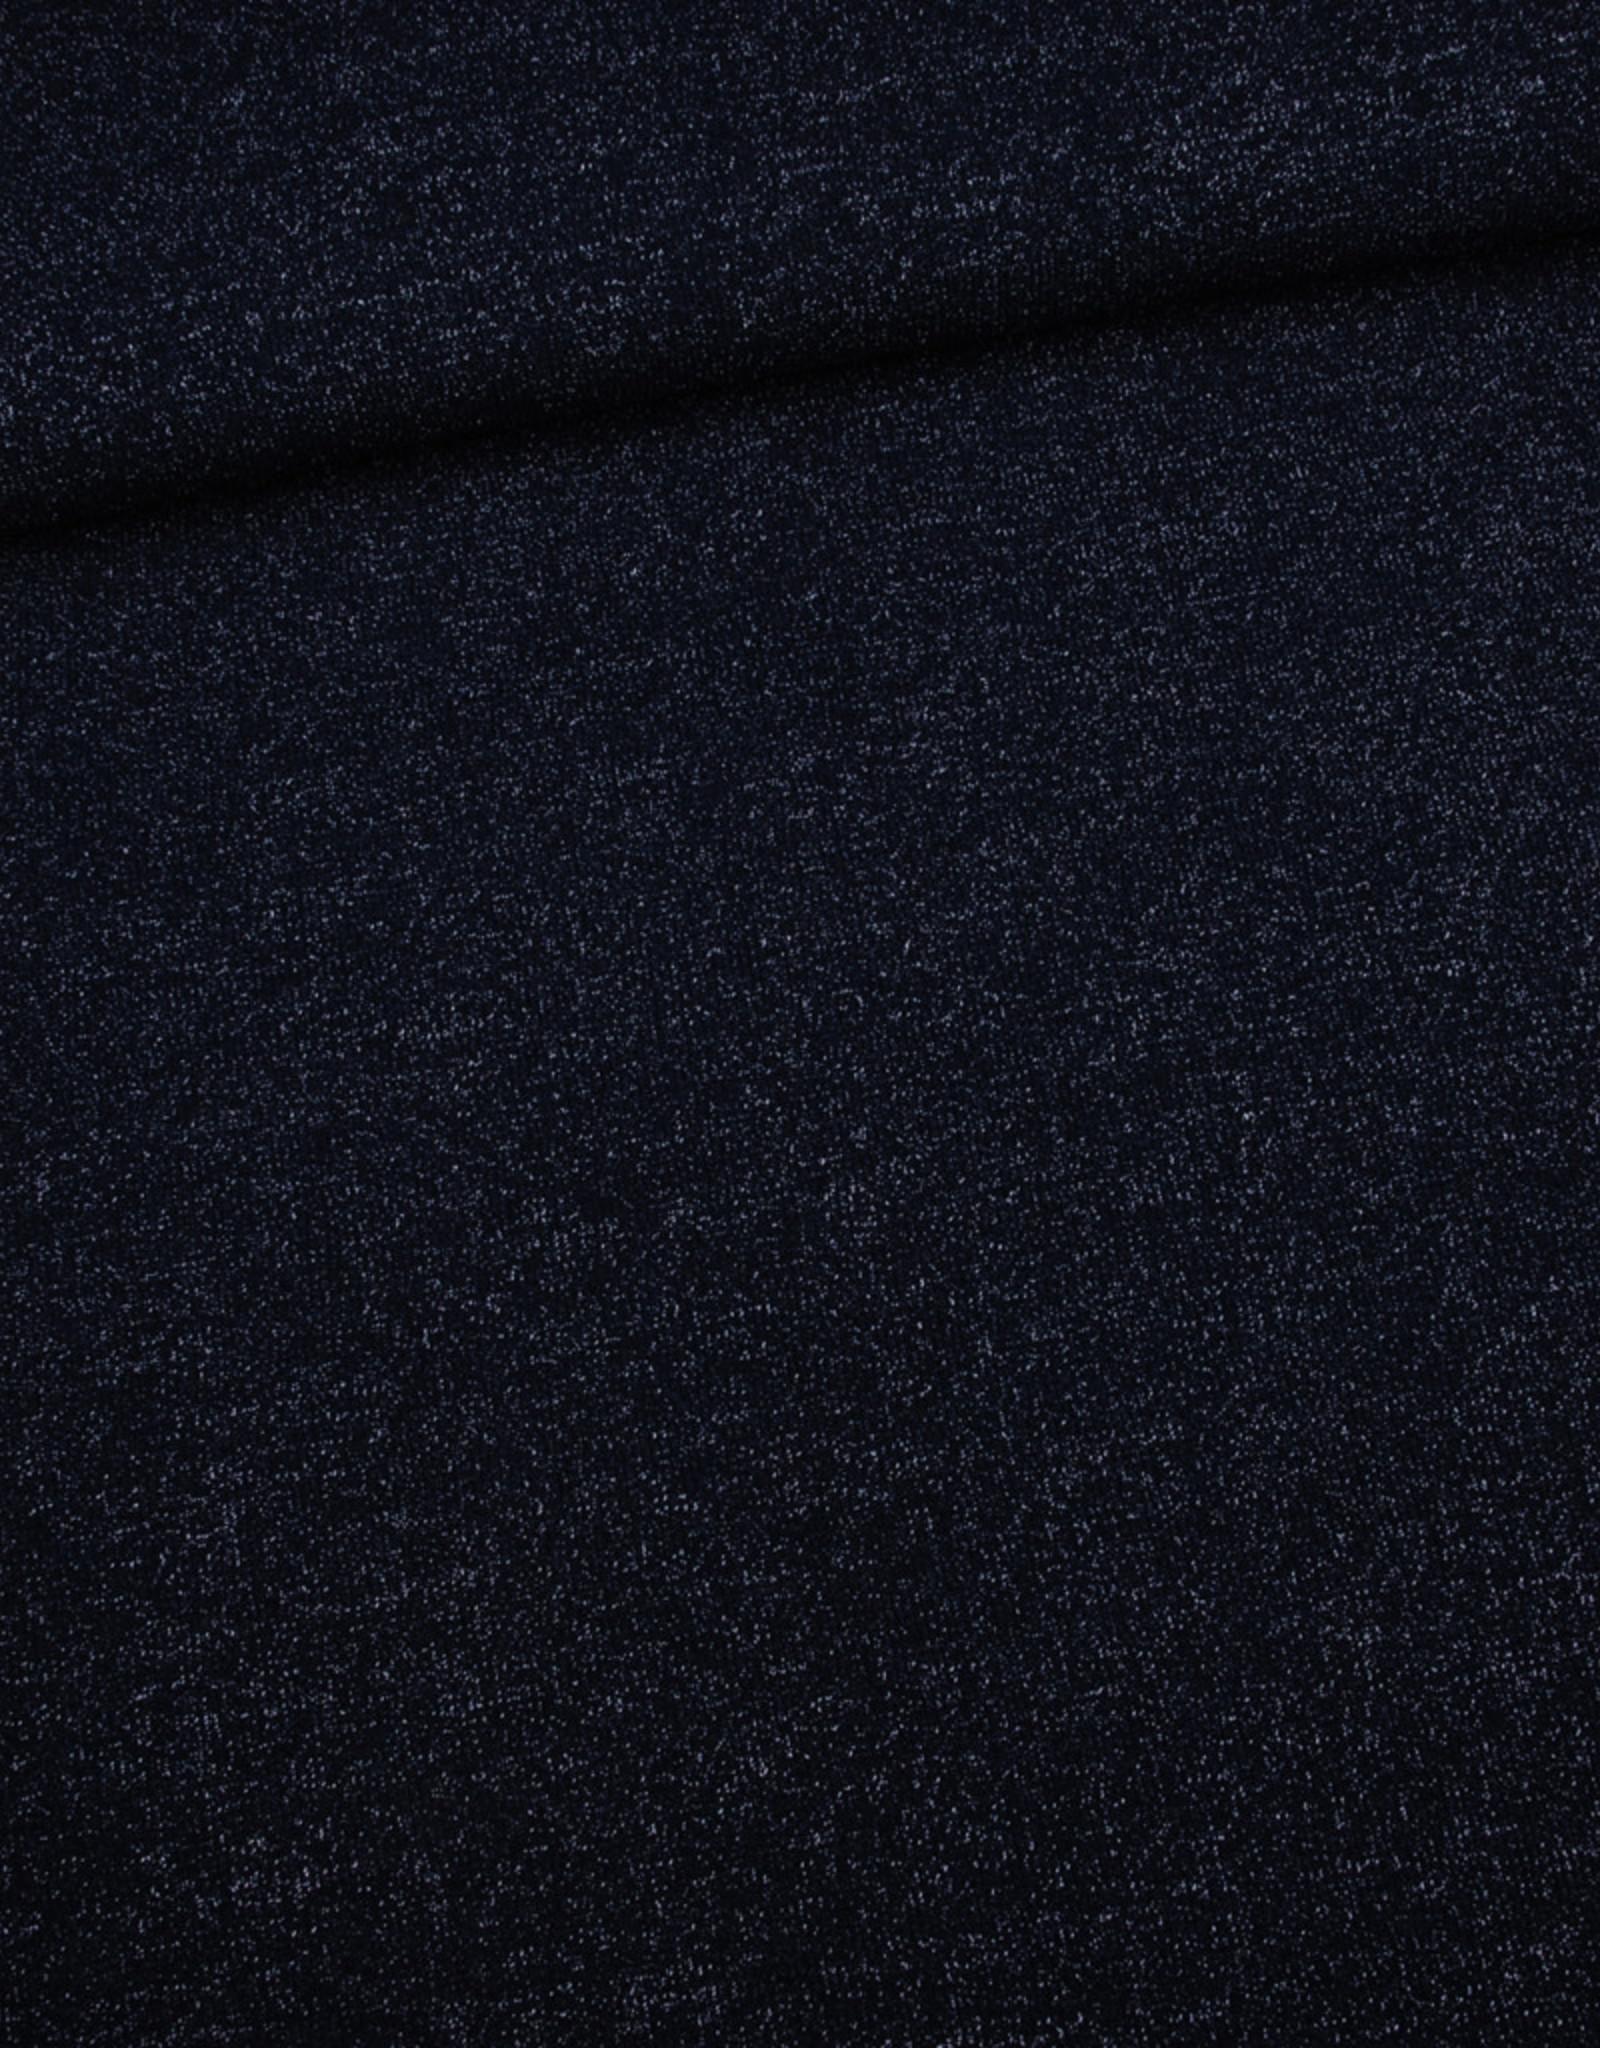 Editex Fabrics Editex Knitted Lurex donkerblauw met glitter